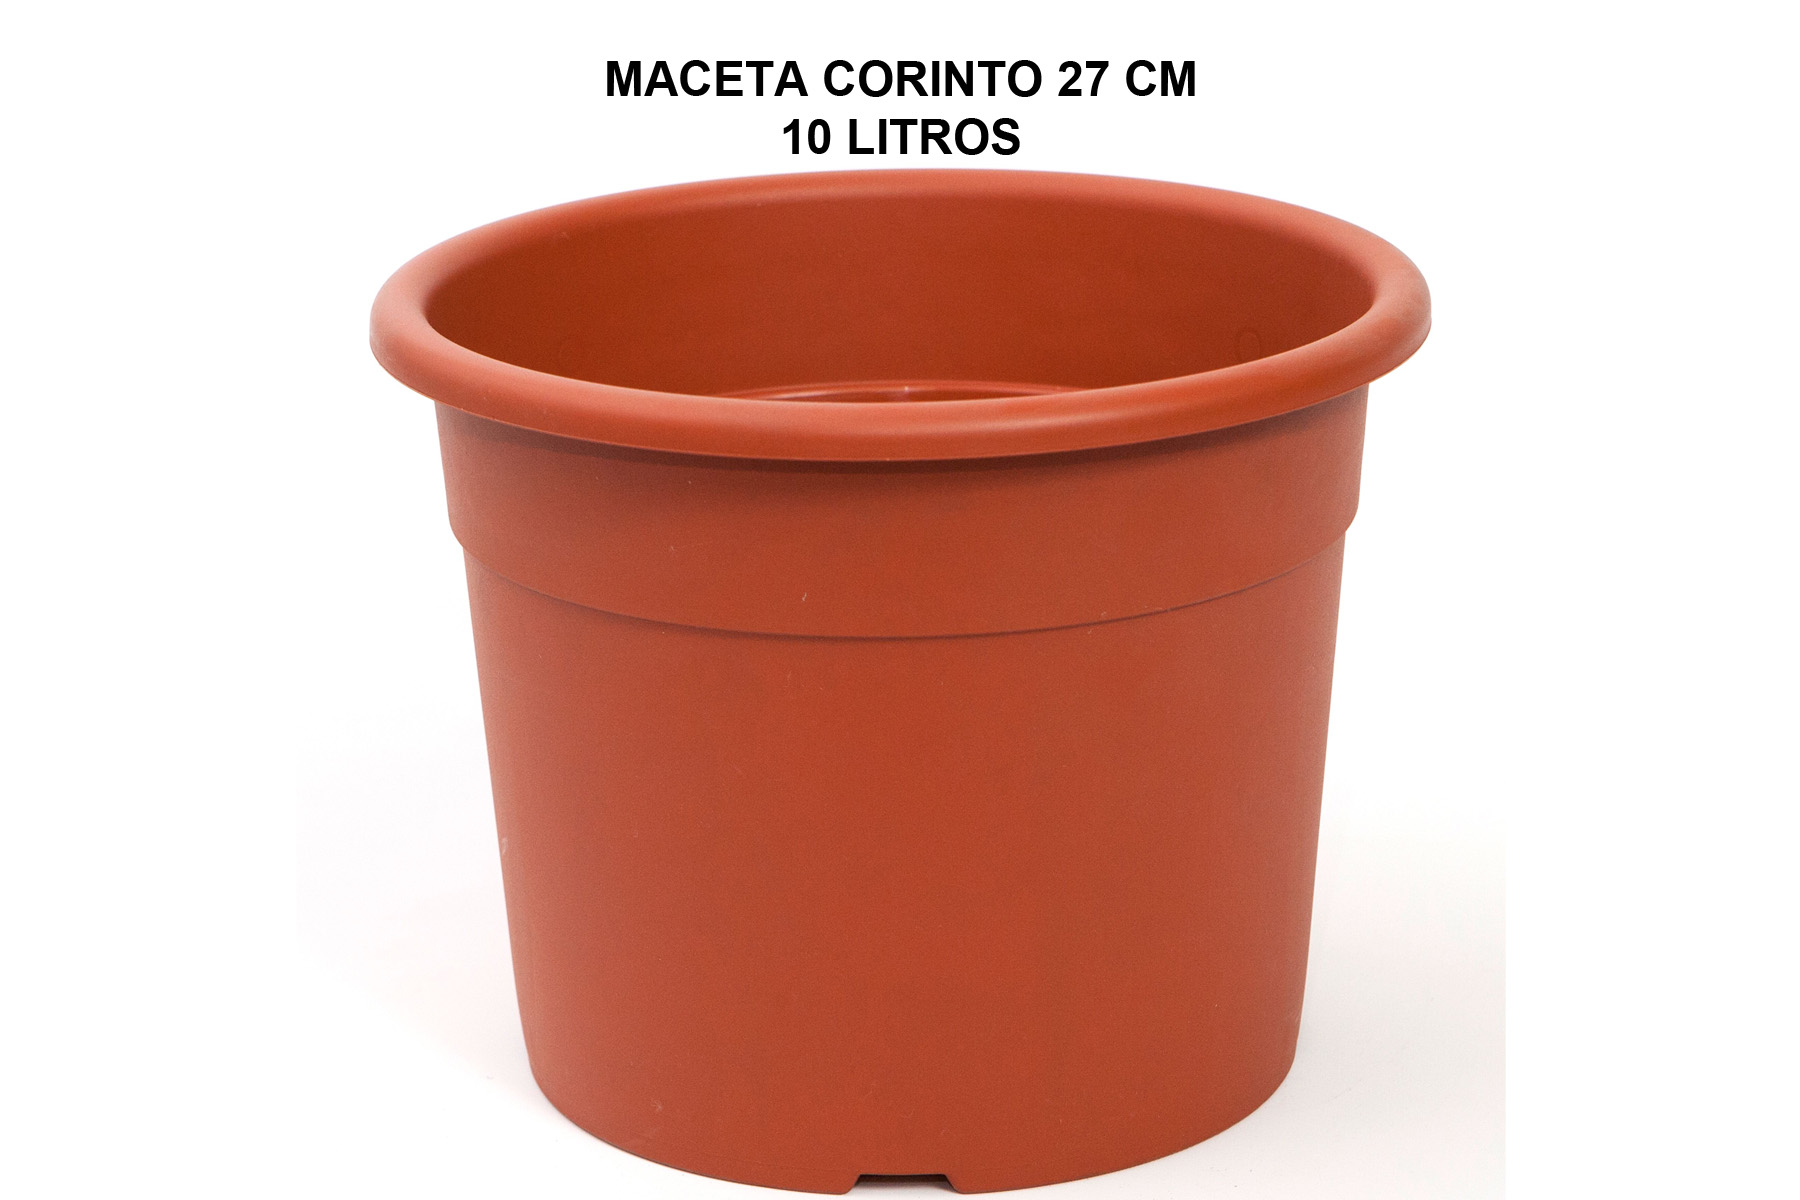 MACETA CORINTO 27 CM P